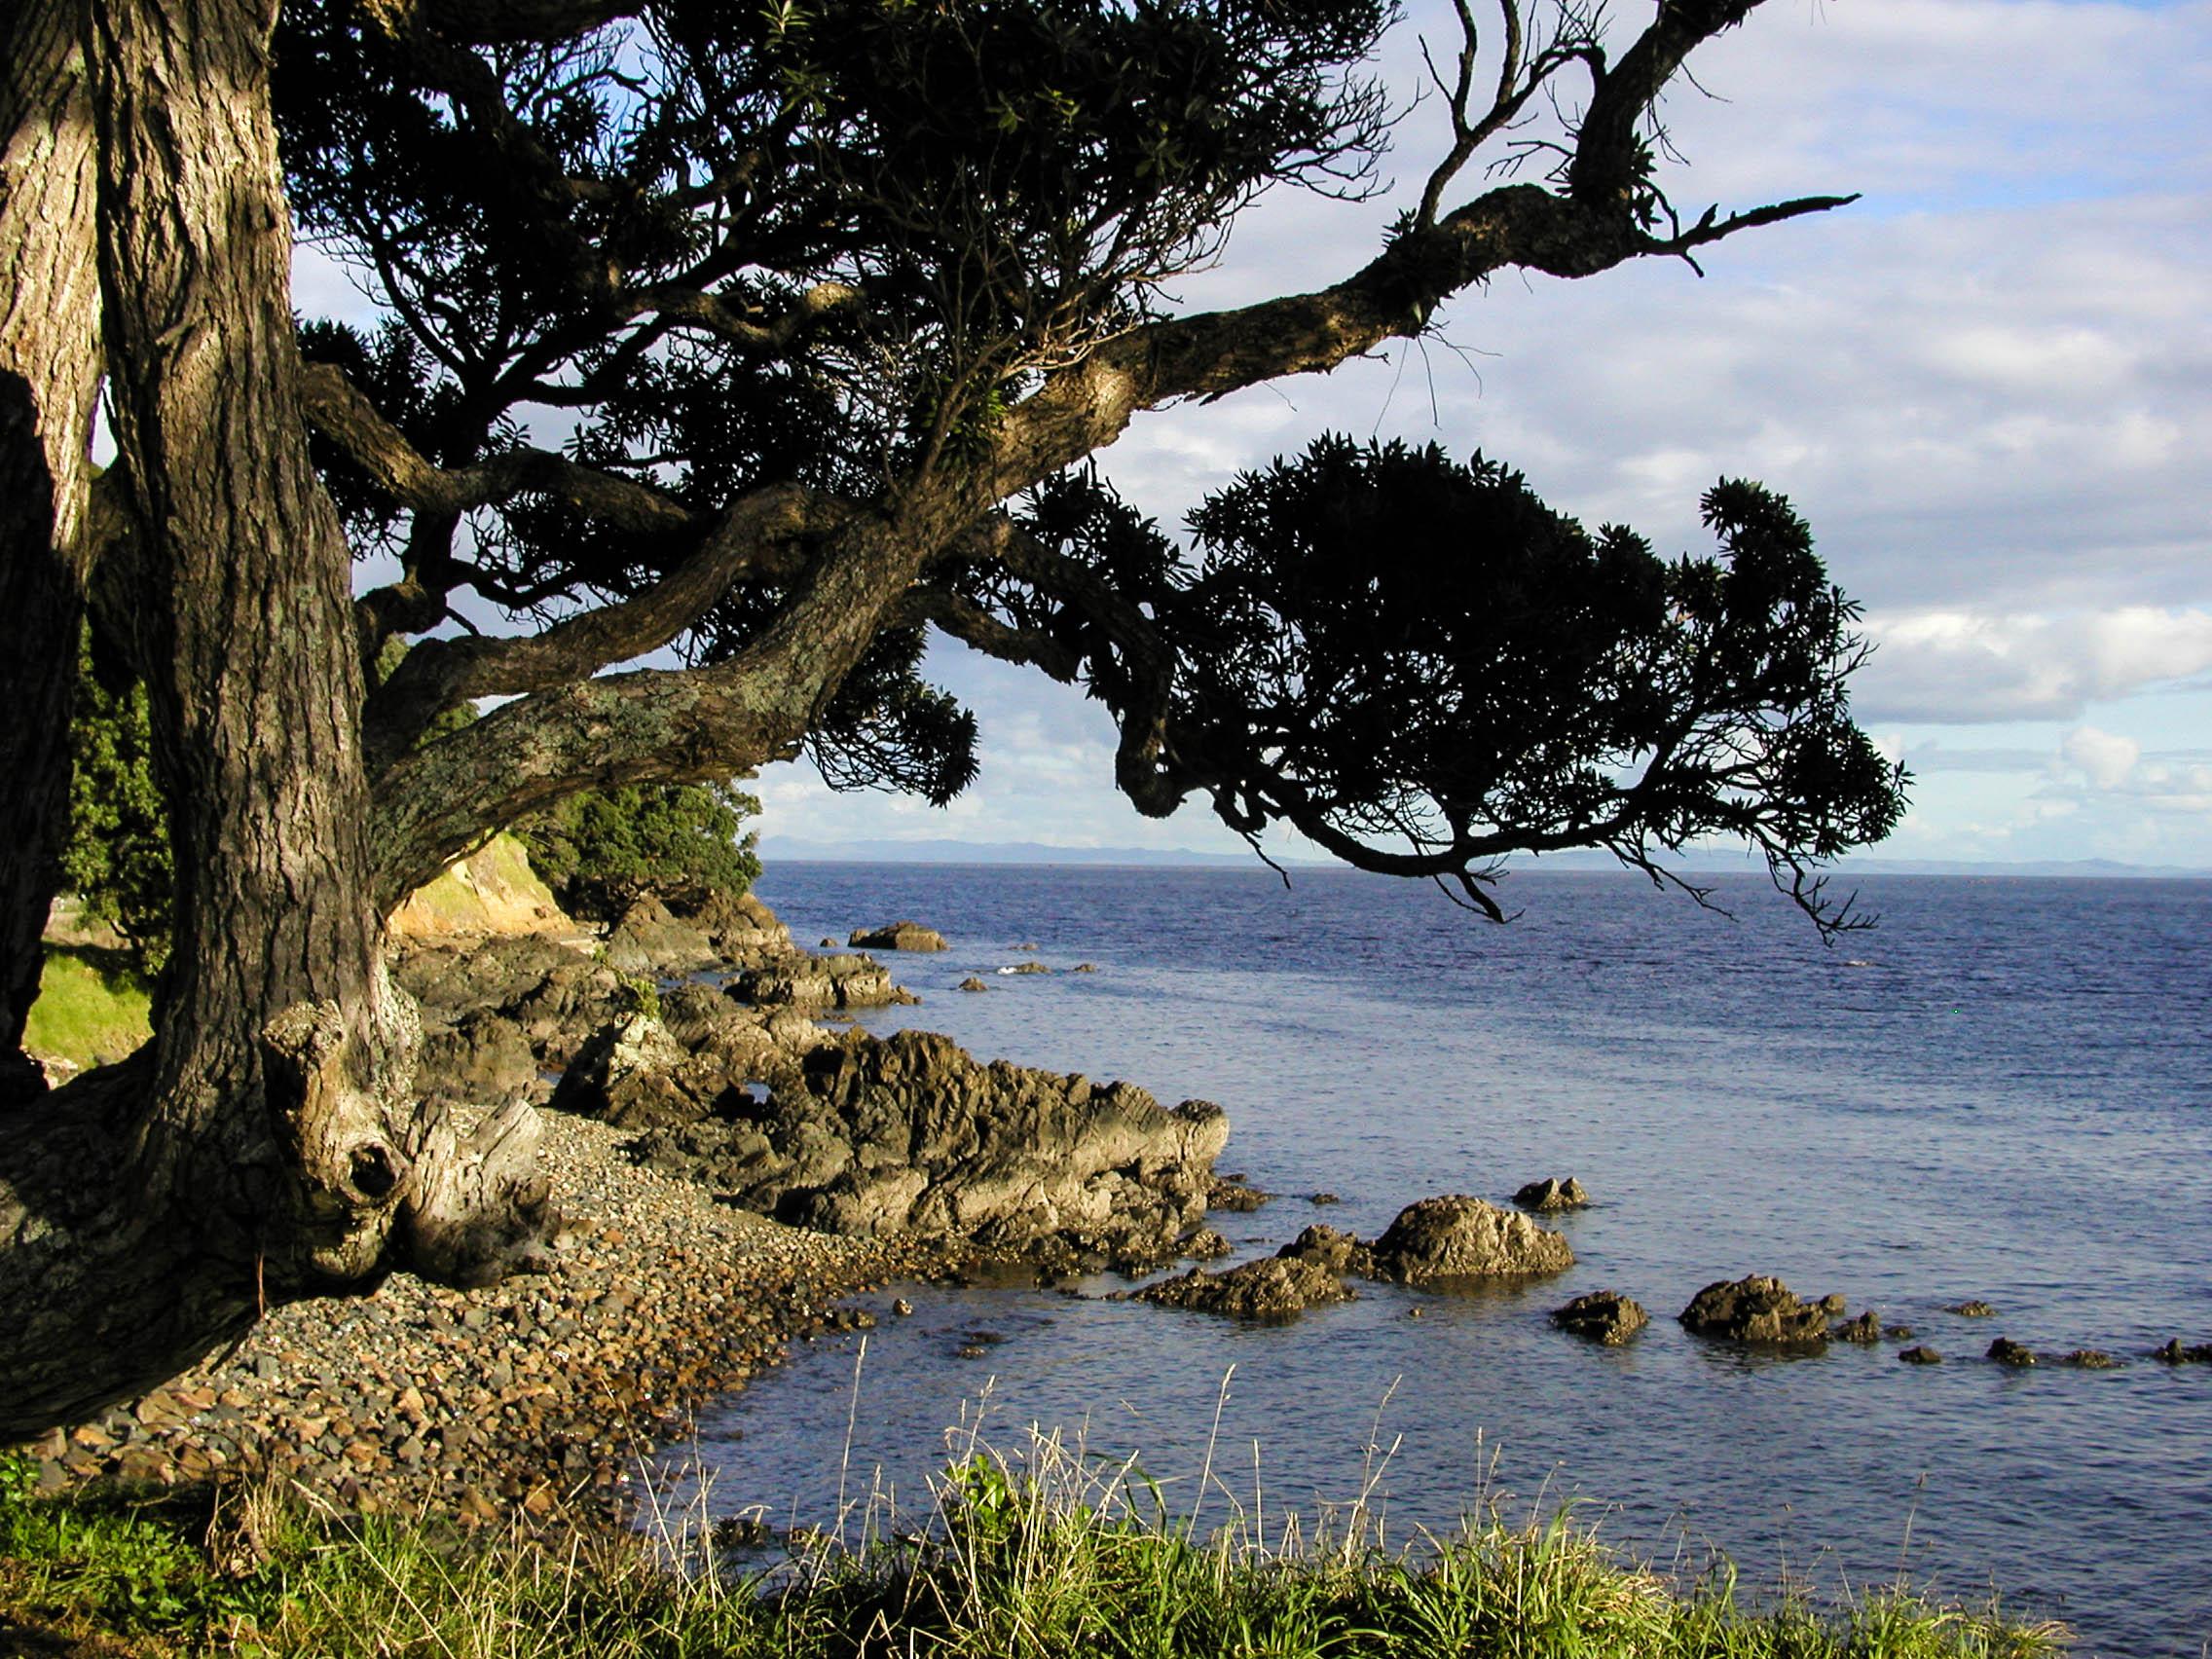 View from the Coromandel Peninsula